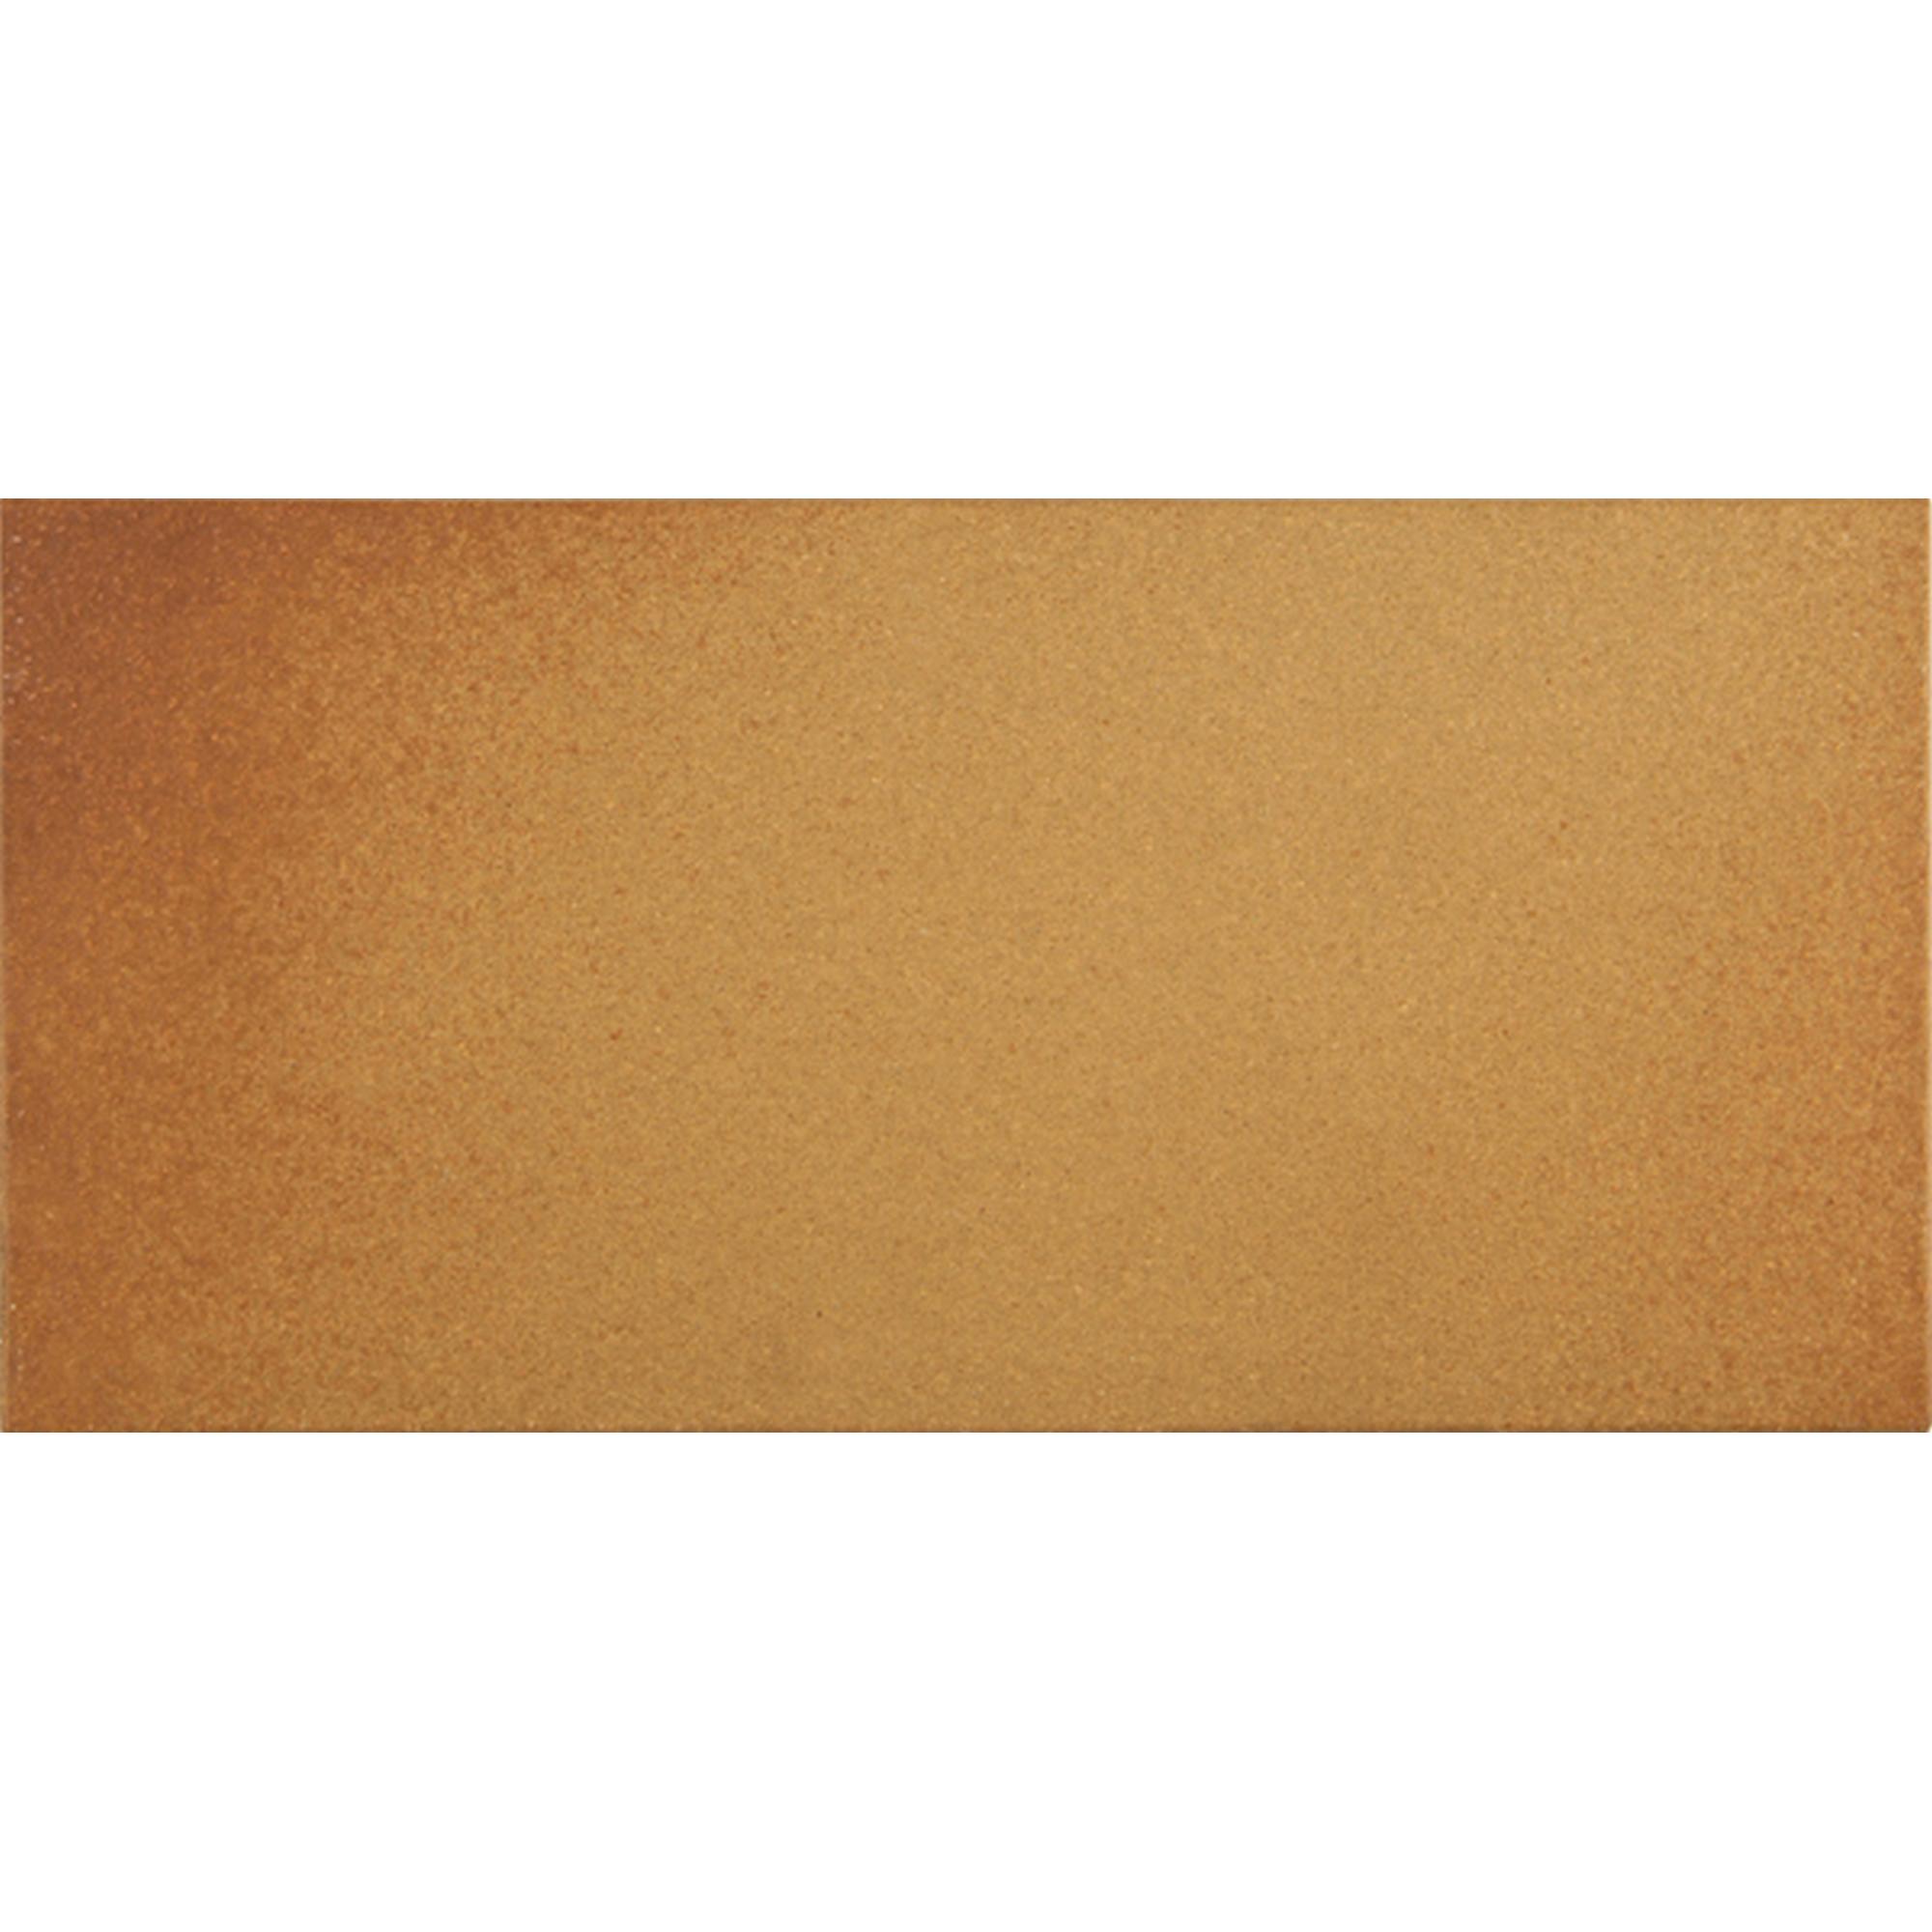 spaltplatte herbstlaub 24 x 11,5 cm ǀ toom baumarkt